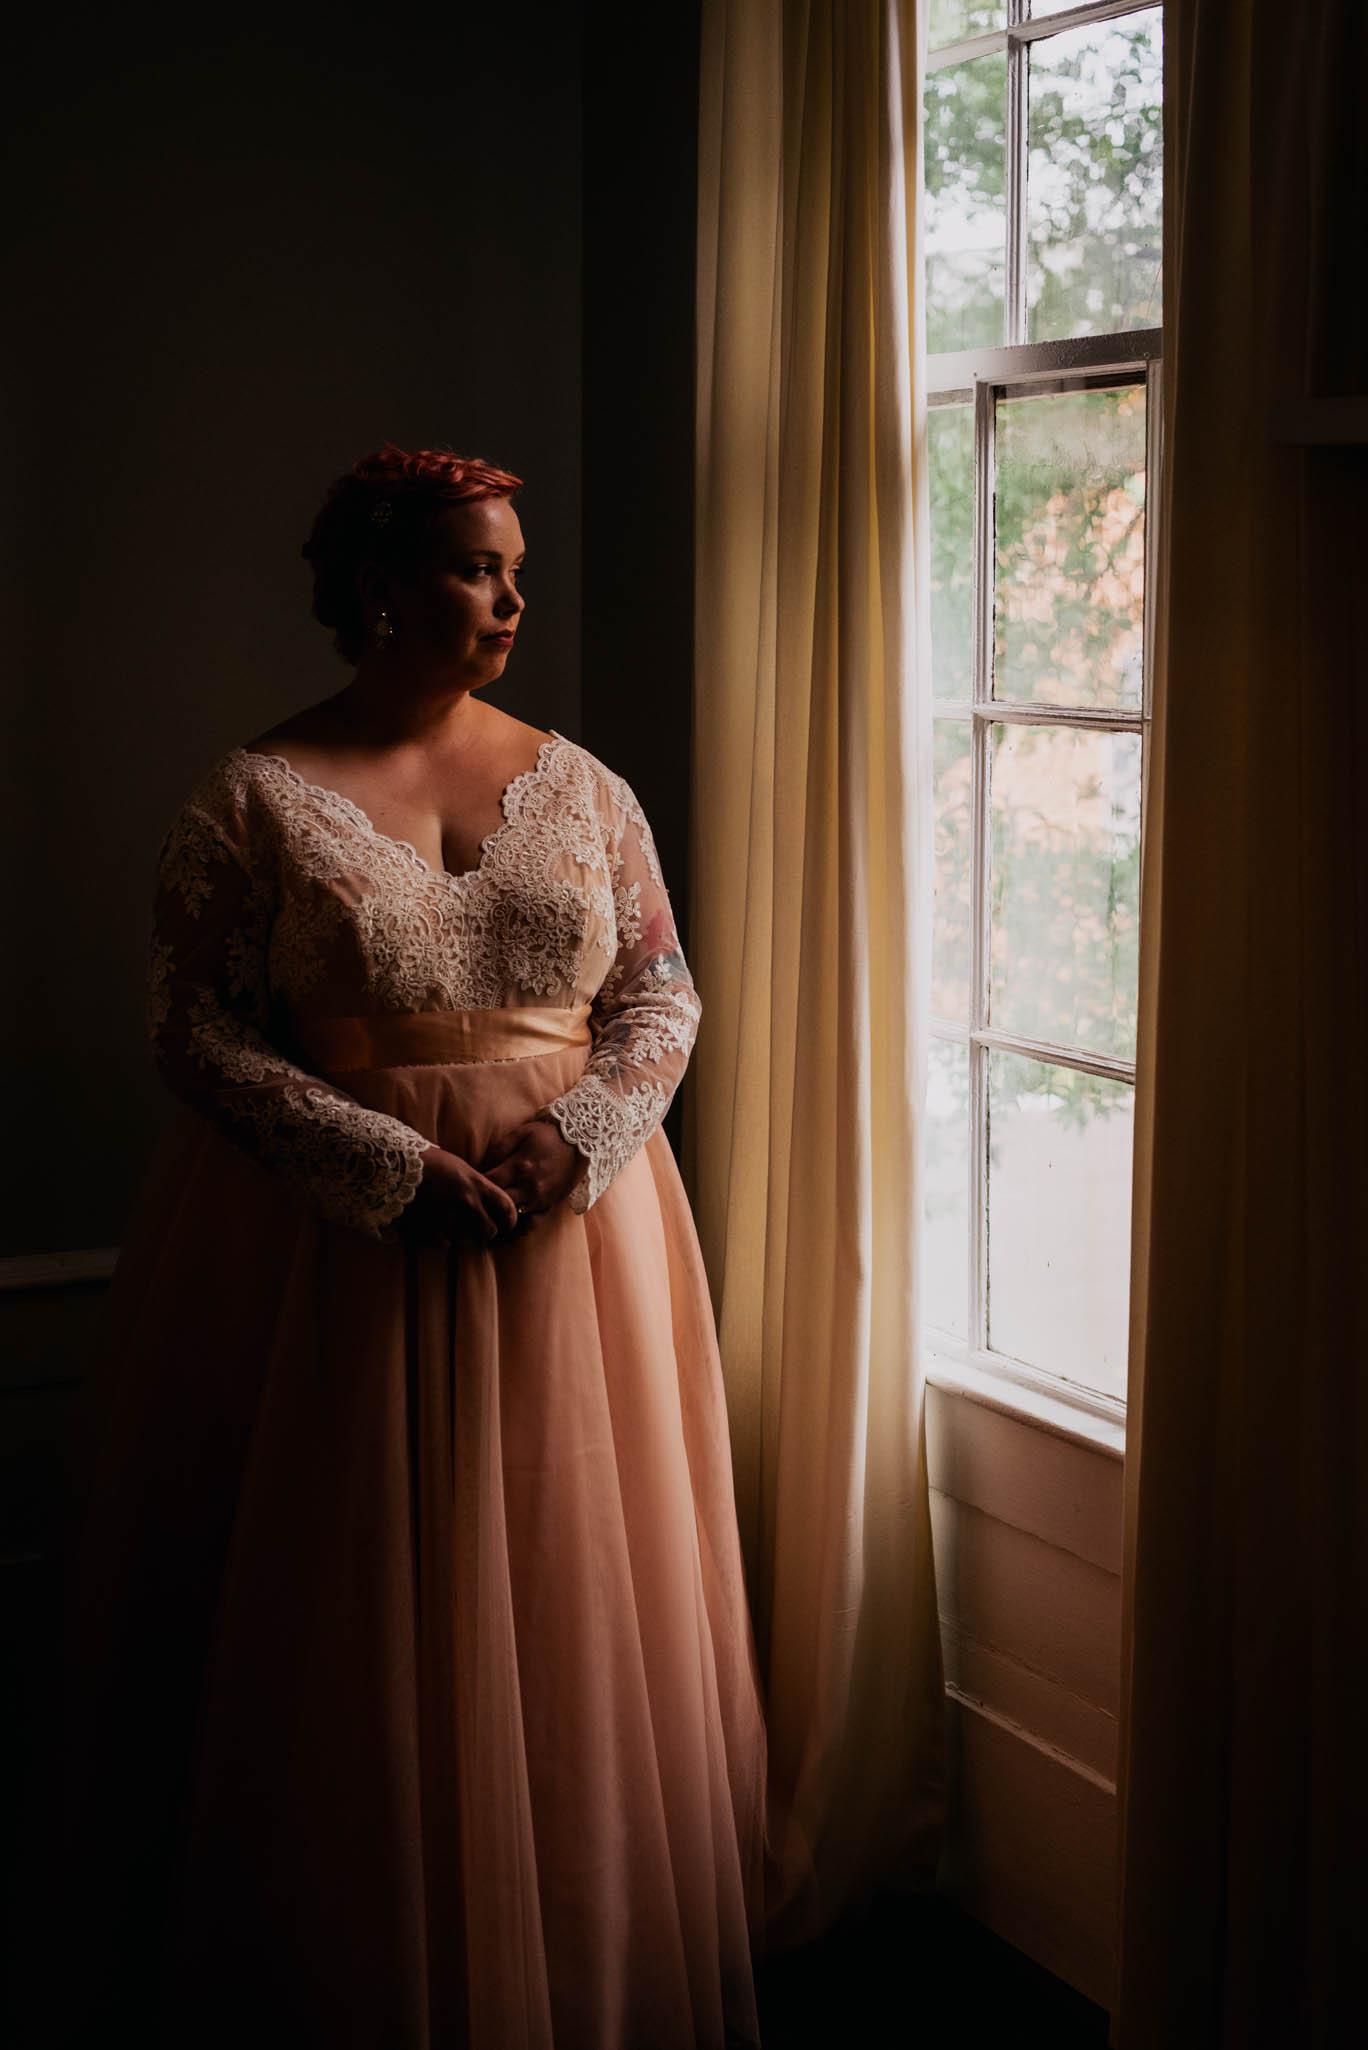 elopement-weddings-raleigh-adam-chapin-photography-1-2.jpg